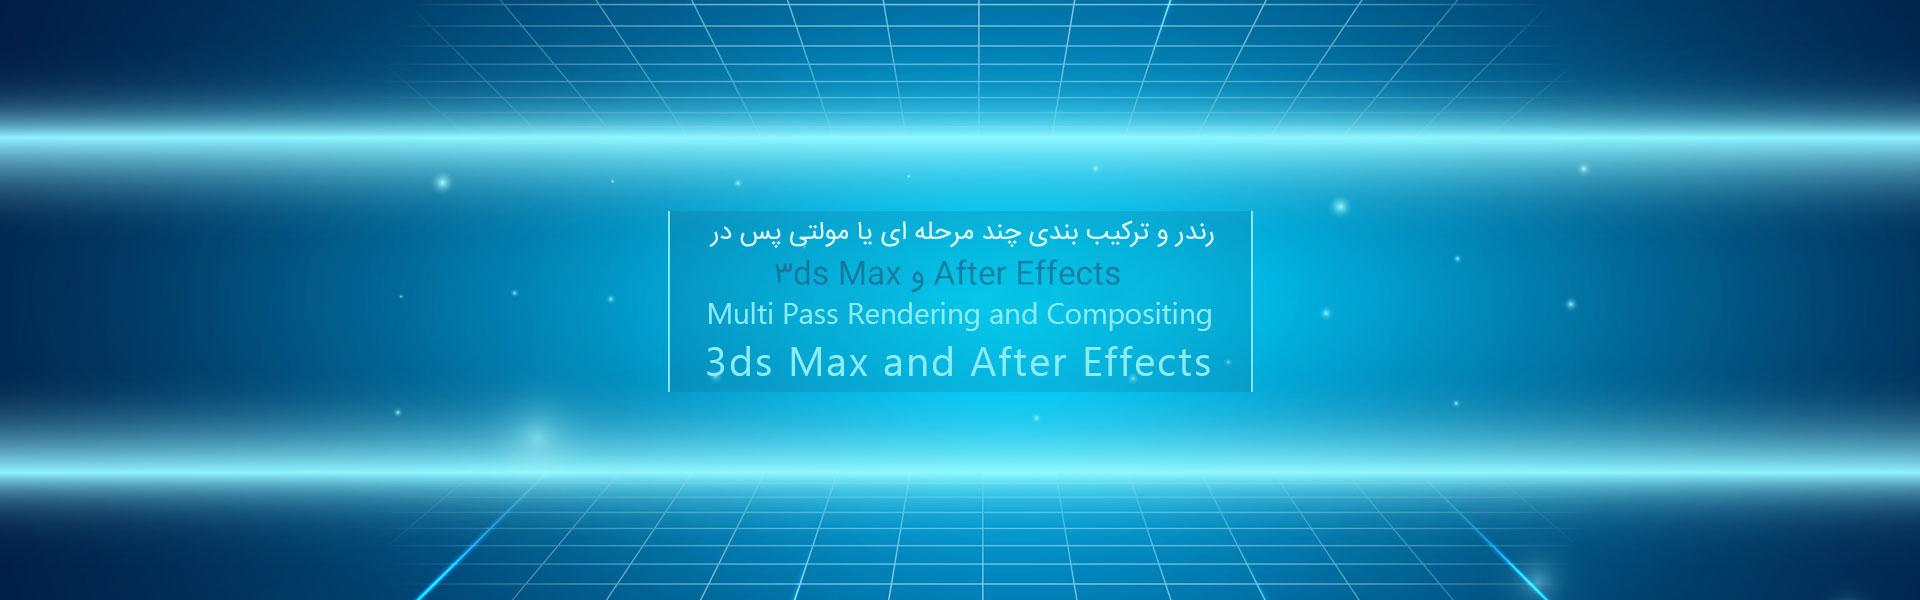 3dsmax multi pass rendering - رندر و ترکیب بندی چند مرحله ای یا مولتی پس در 3ds Max و After Effects